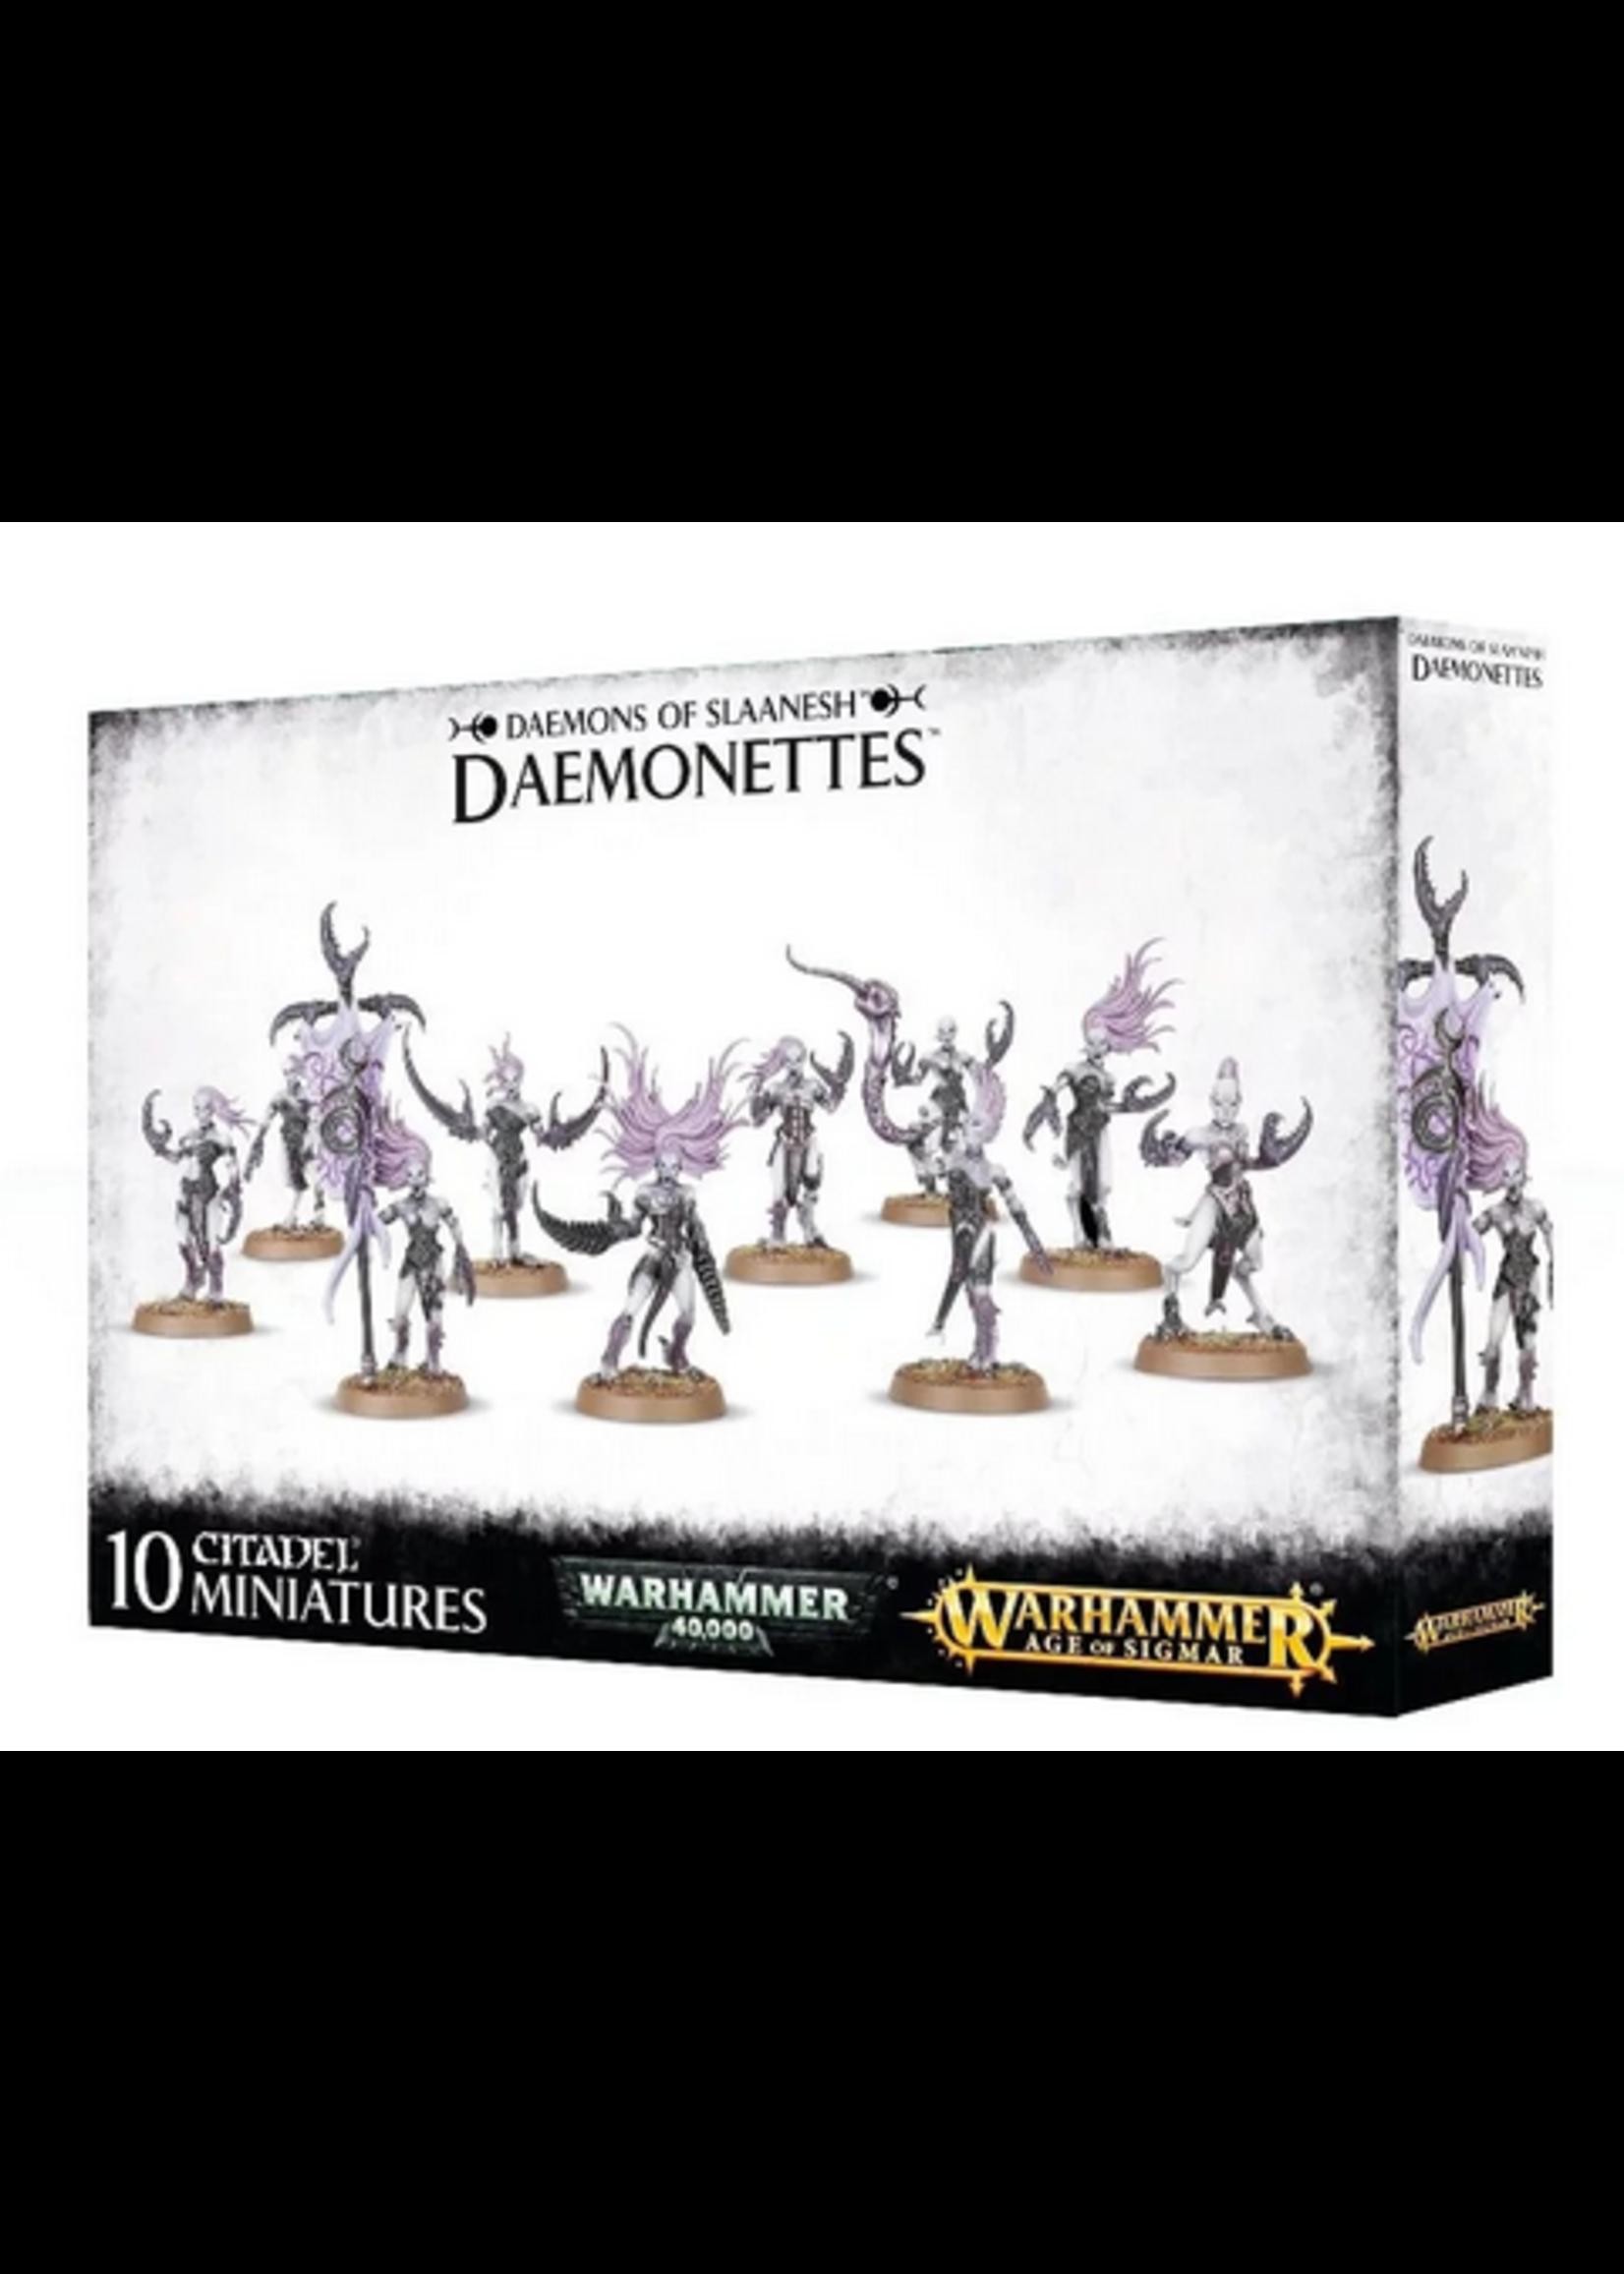 Daemonettes of Slaanesh (AOS)